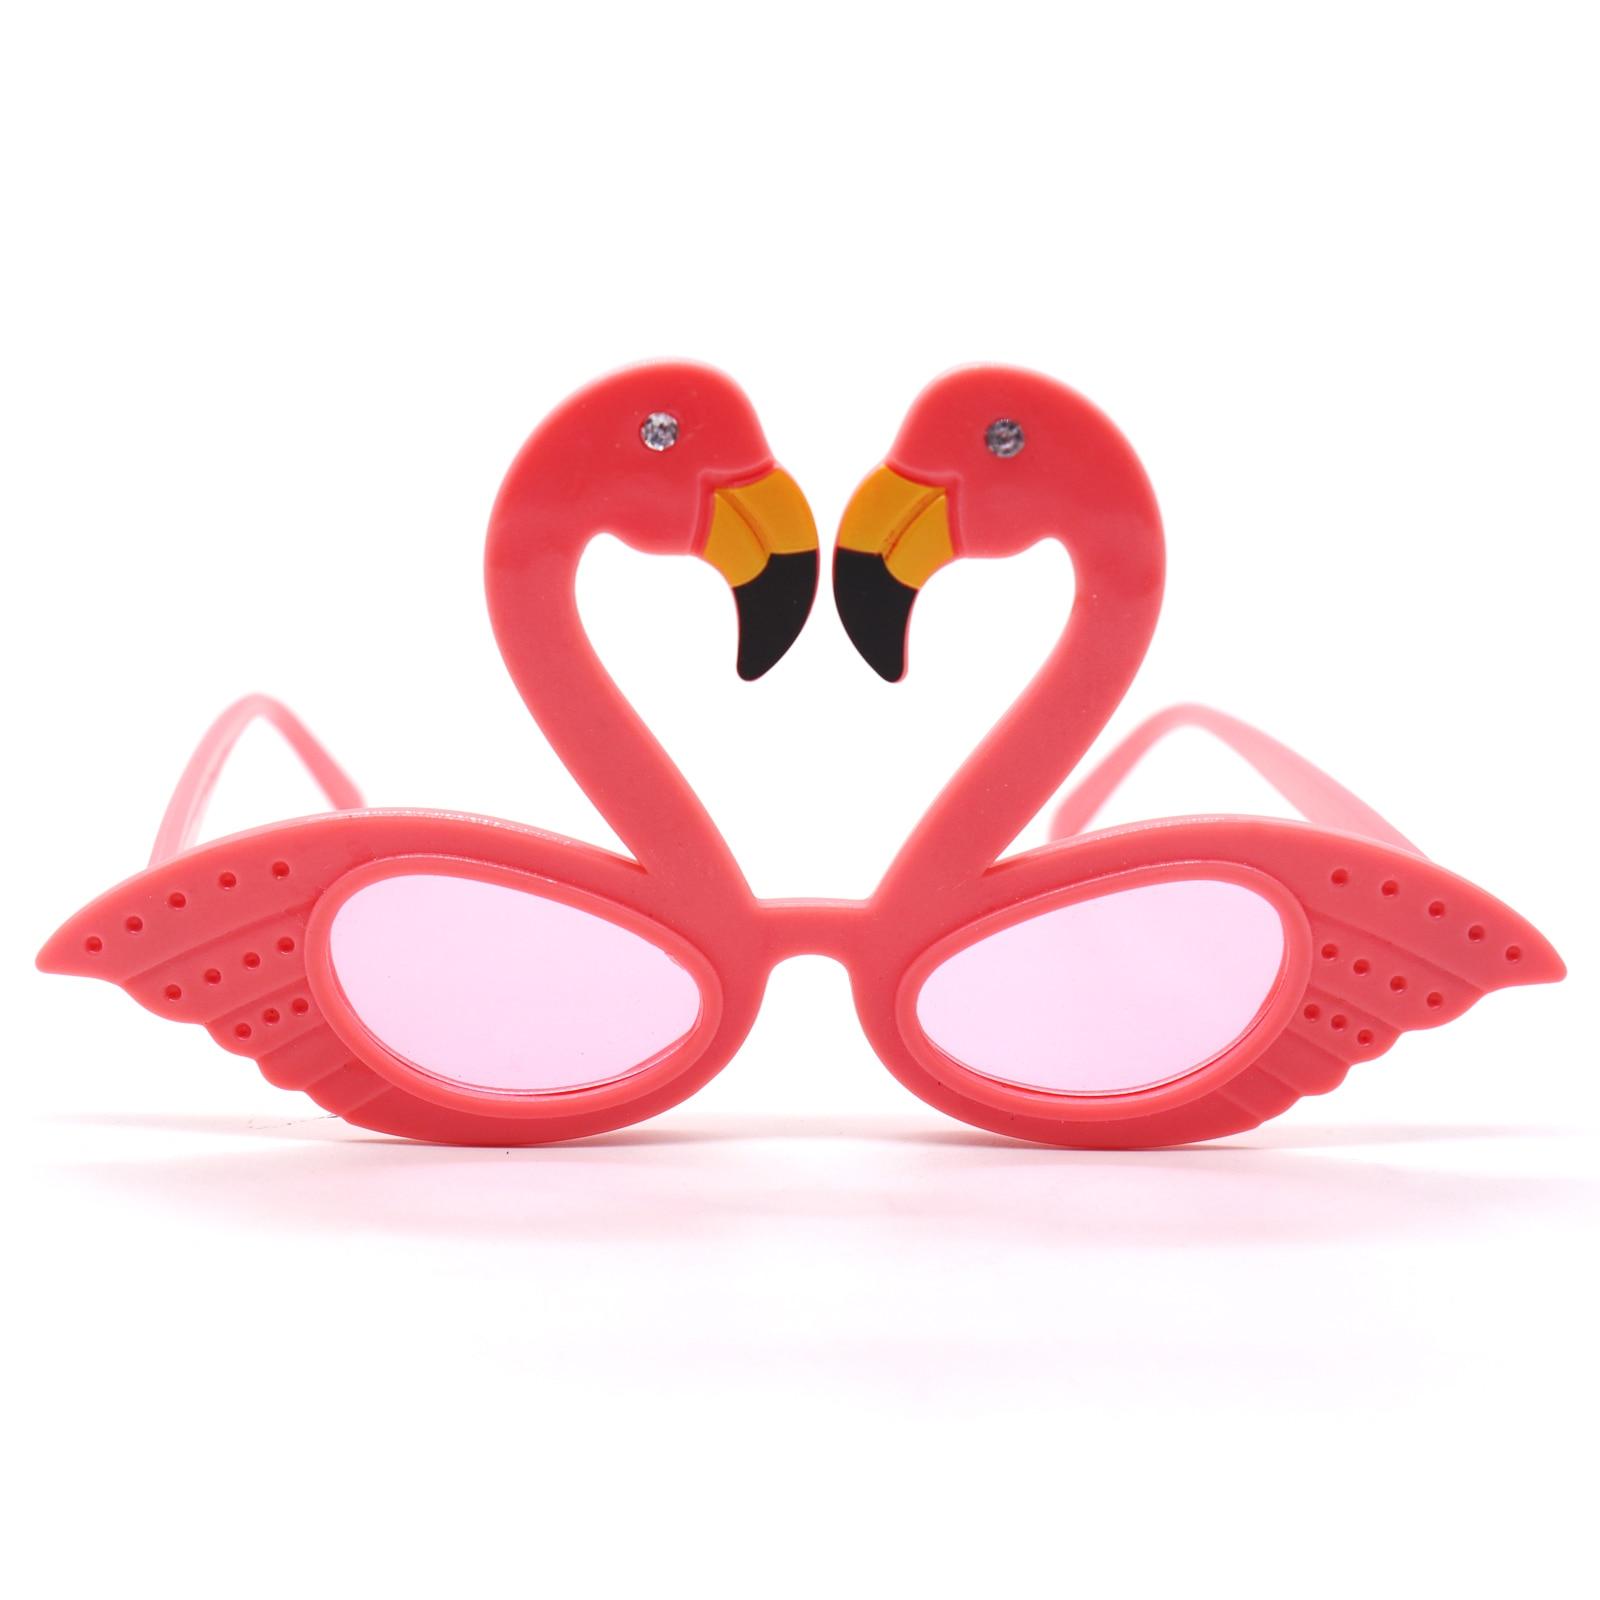 Hawaiian Tropical Floral /& Flamingo CockTail Novelty Sunglasses Fancy Dress